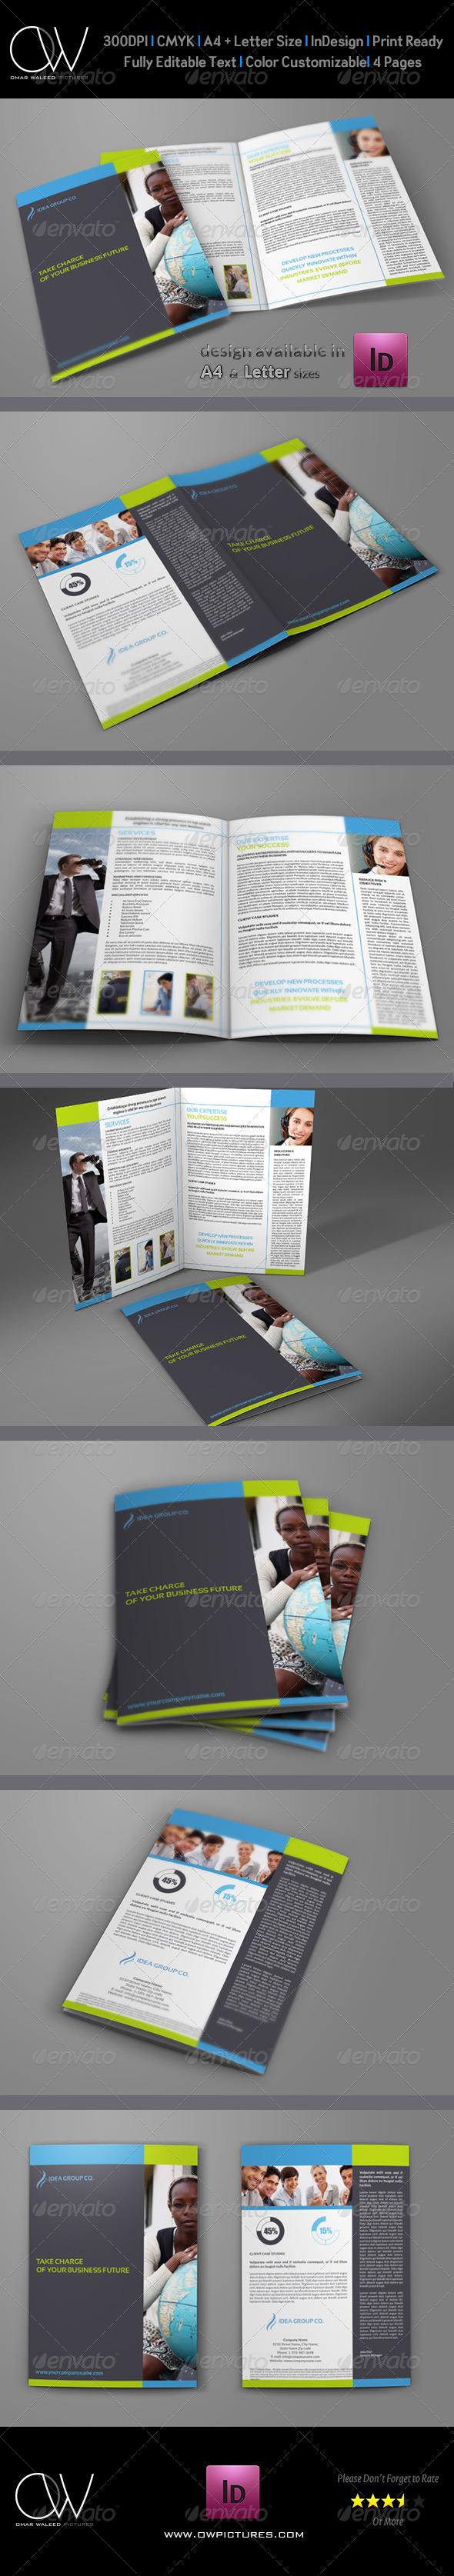 Company Brochure Bi-Fold Template Vol.13 - Corporate Brochures